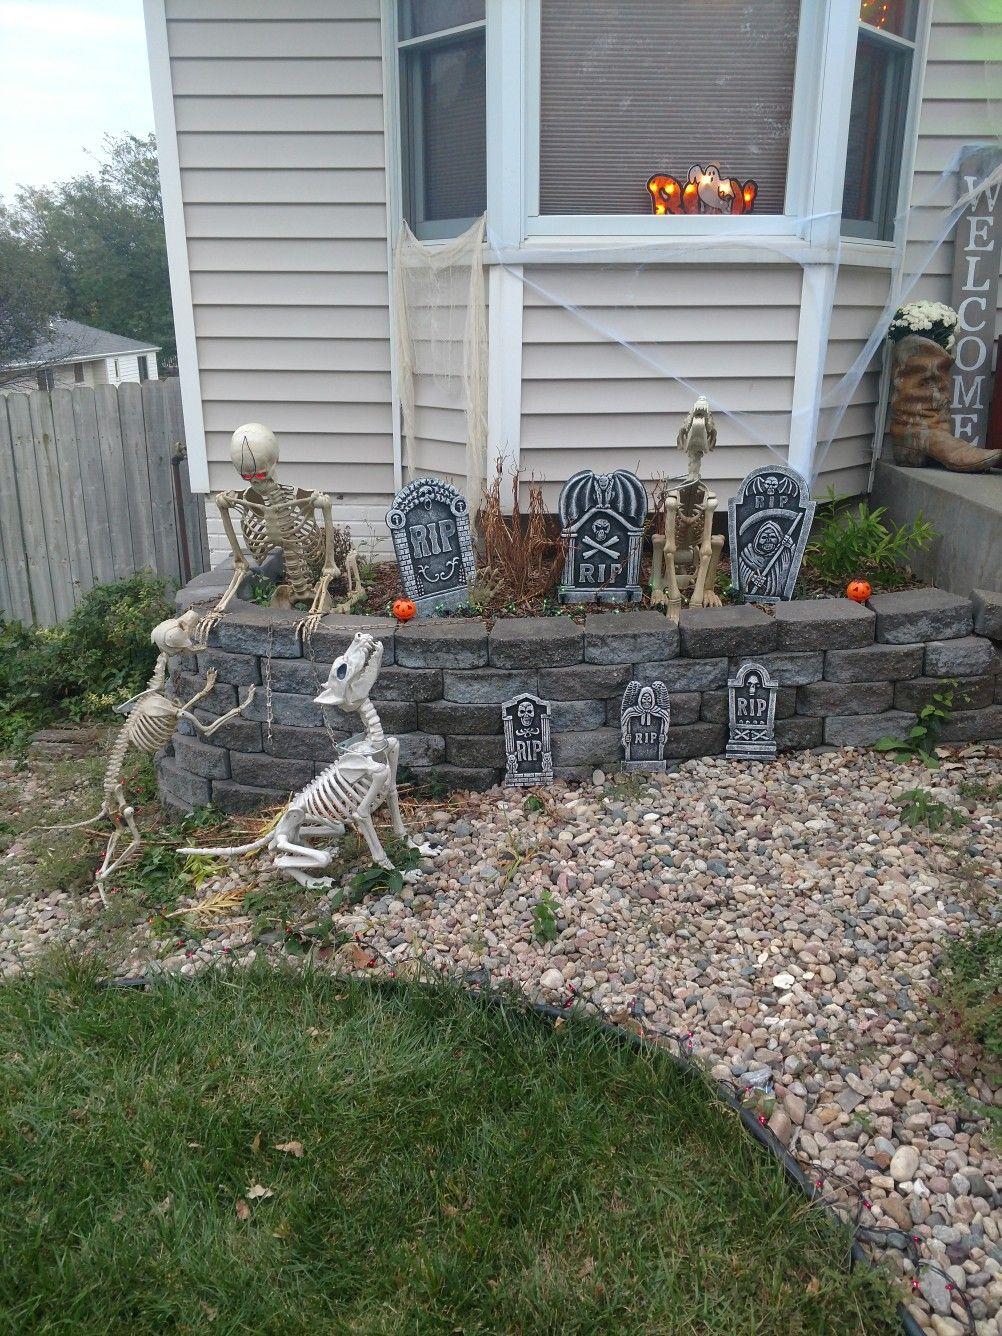 pet cemetery skeleton dog skeleton halloween decorations graveyard boneyard